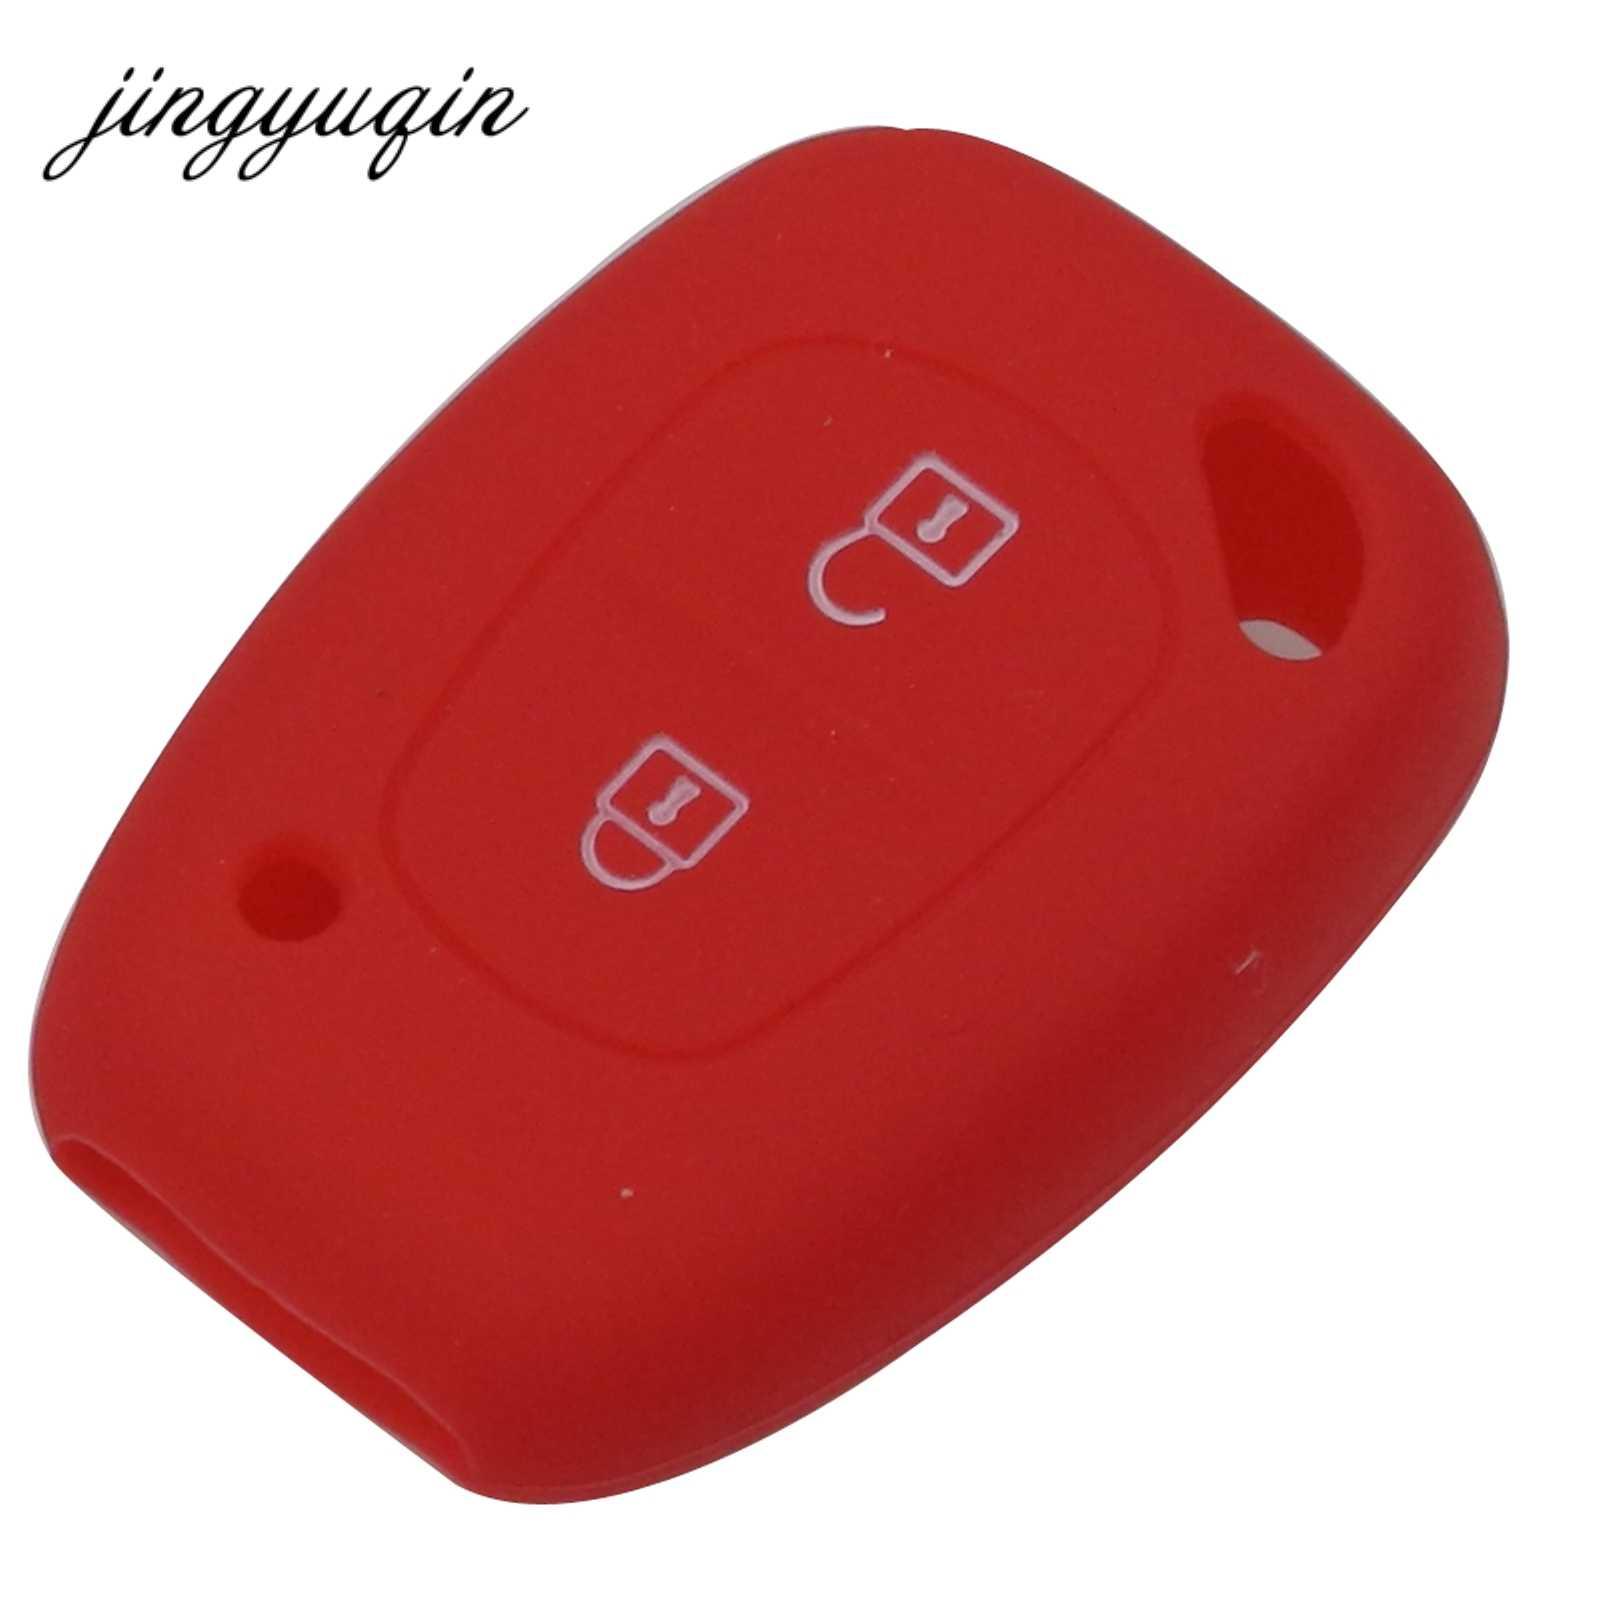 Jingyuqin סיליקון רכב מפתח Fob כיסוי מקרה עבור רנו Vivaro Movano התנועה מאסטר Kangoo עבור ניסן אופל